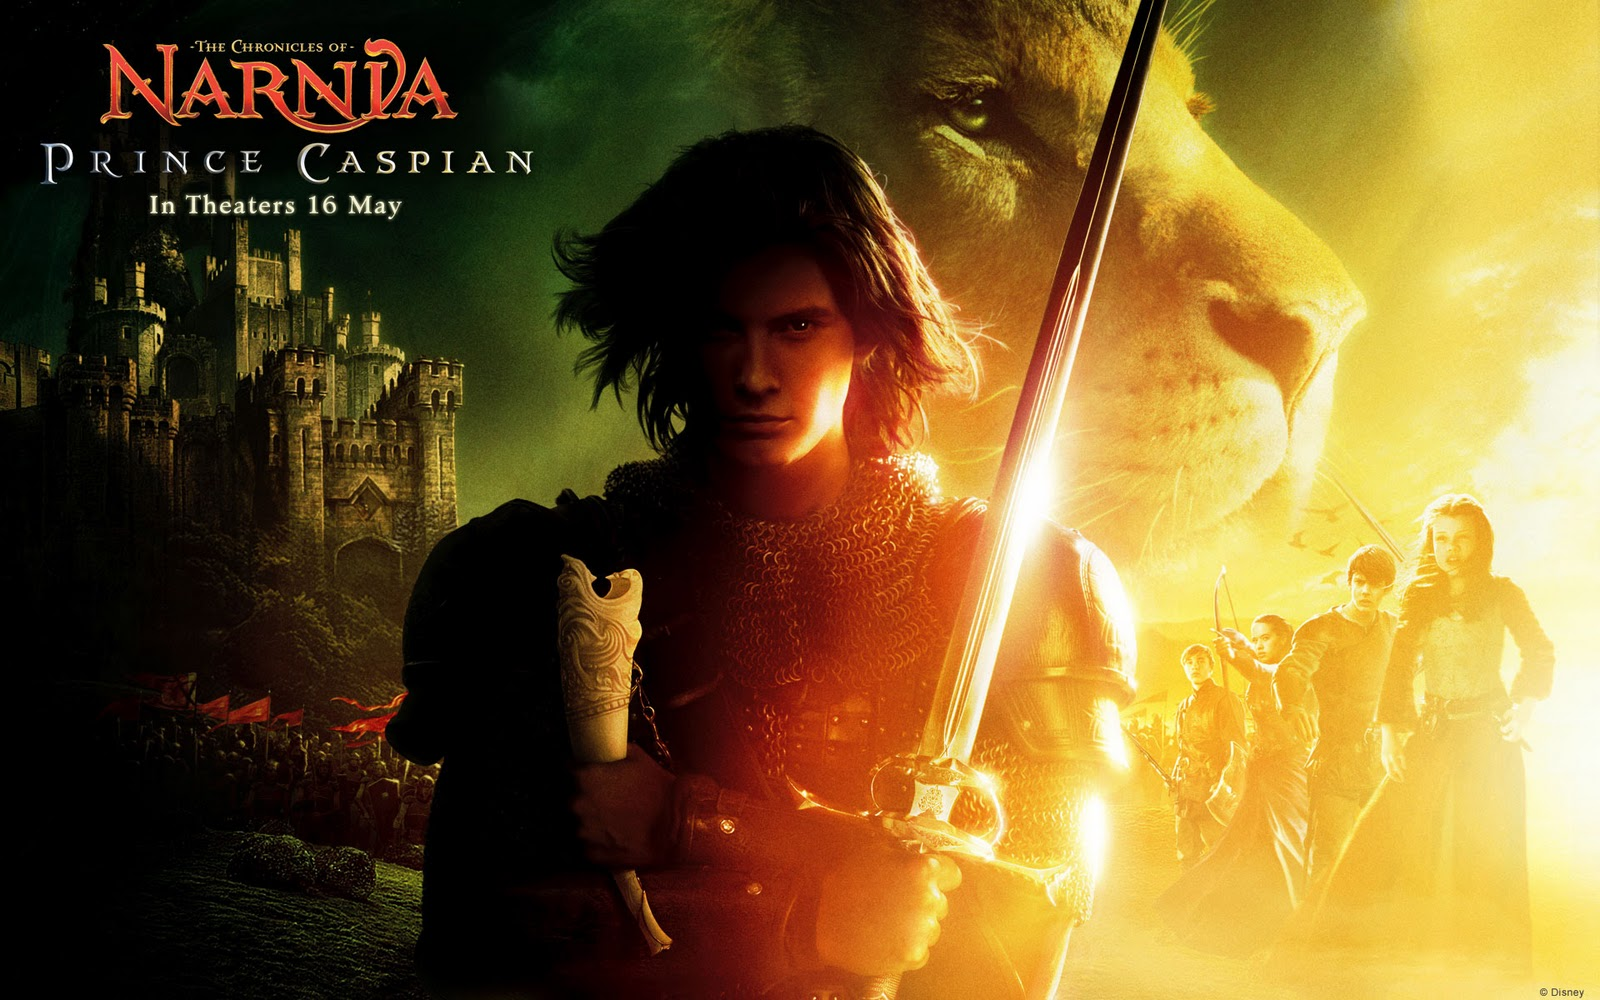 https://lh3.googleusercontent.com/-9DVloIEDkOo/TWuHPsPVC6I/AAAAAAAAAvc/ciqs8yMvraE/s1600/Ben_Barnes_in_The_Chronicles_of_Narnia+_Prince_Caspian_Wallpaper_1_1280.jpg